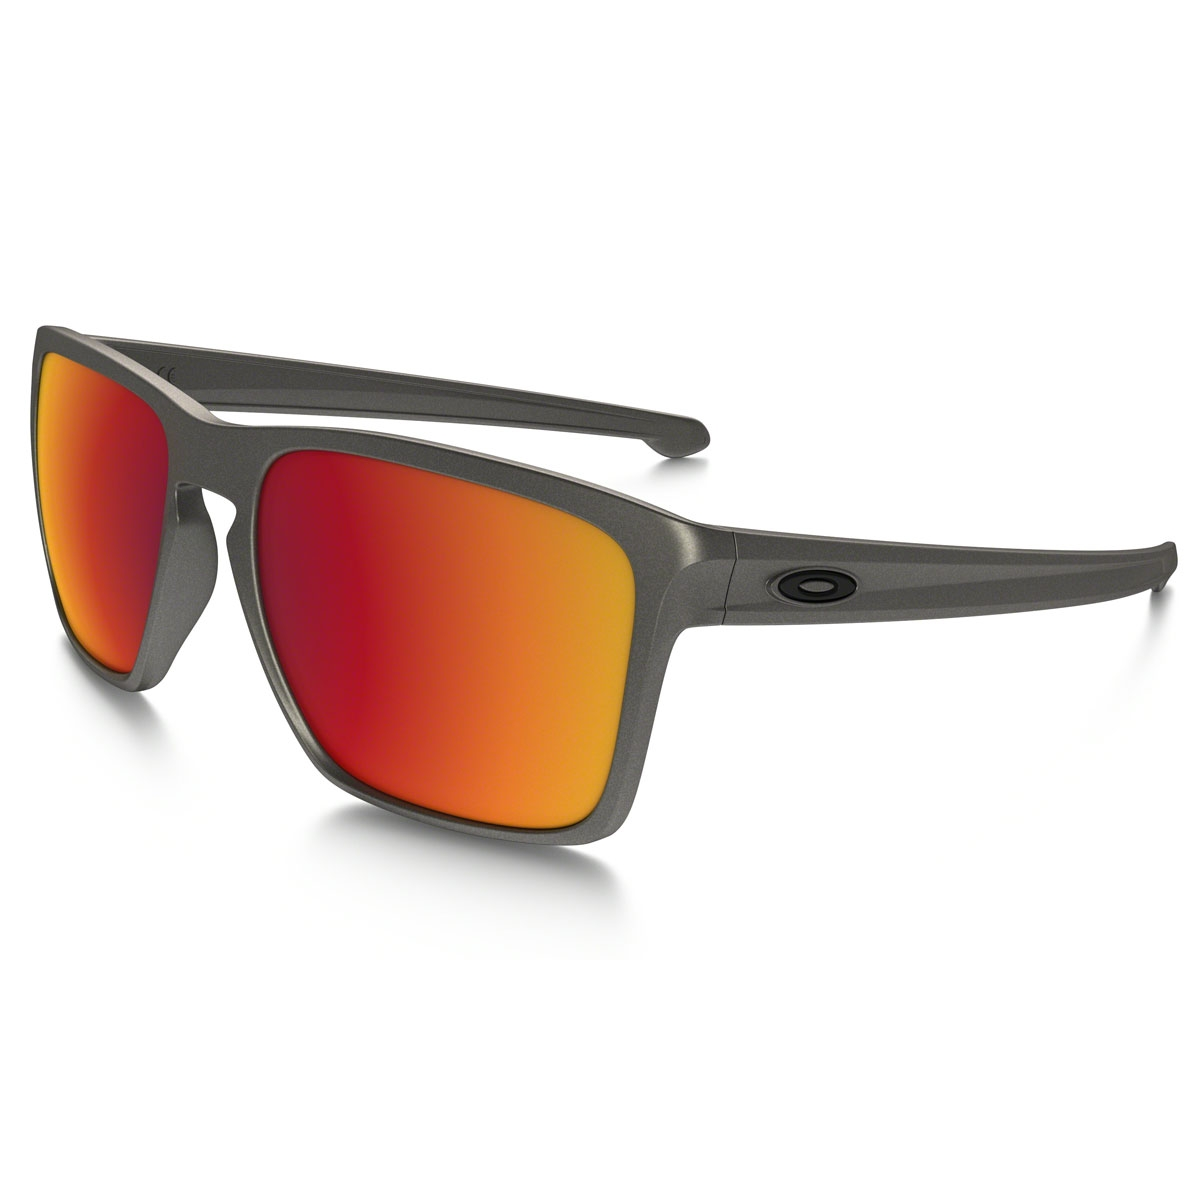 6425a377fe1f2 Image of Oakley Sliver XL Sunglasses - Lead Frame   Torch Iridium Lens